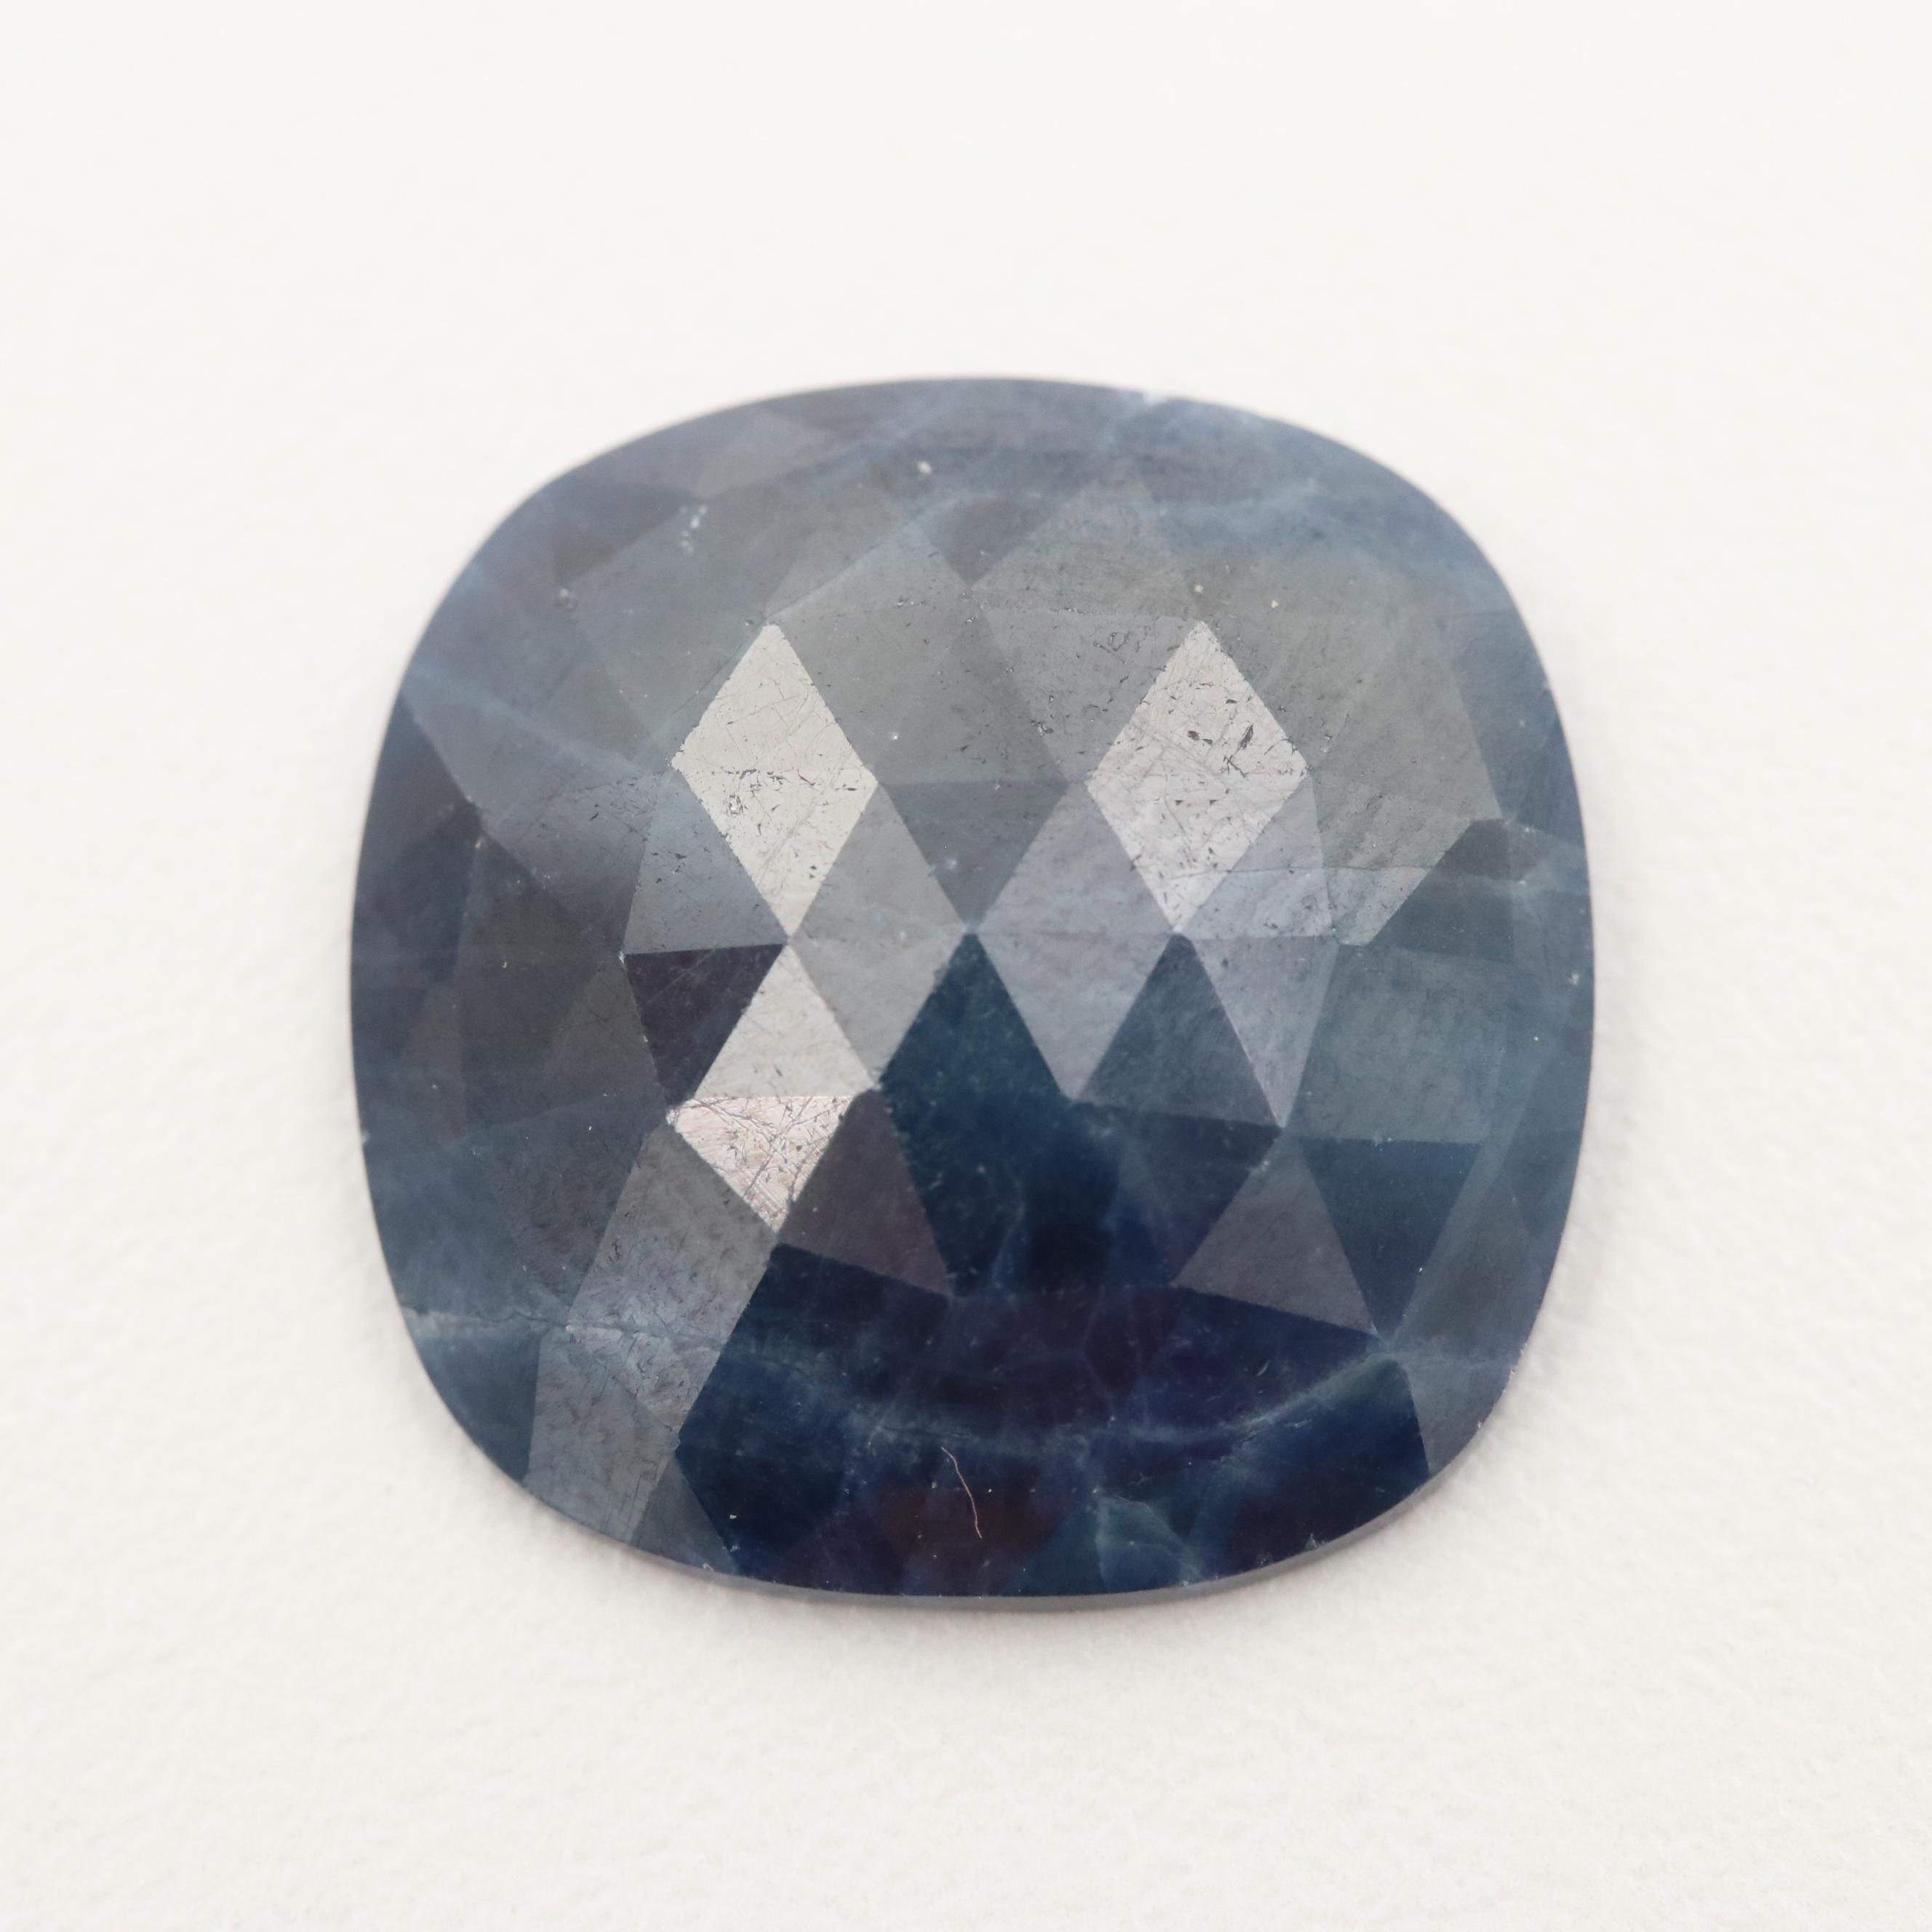 Loose 15.83 CT Sapphire Stone